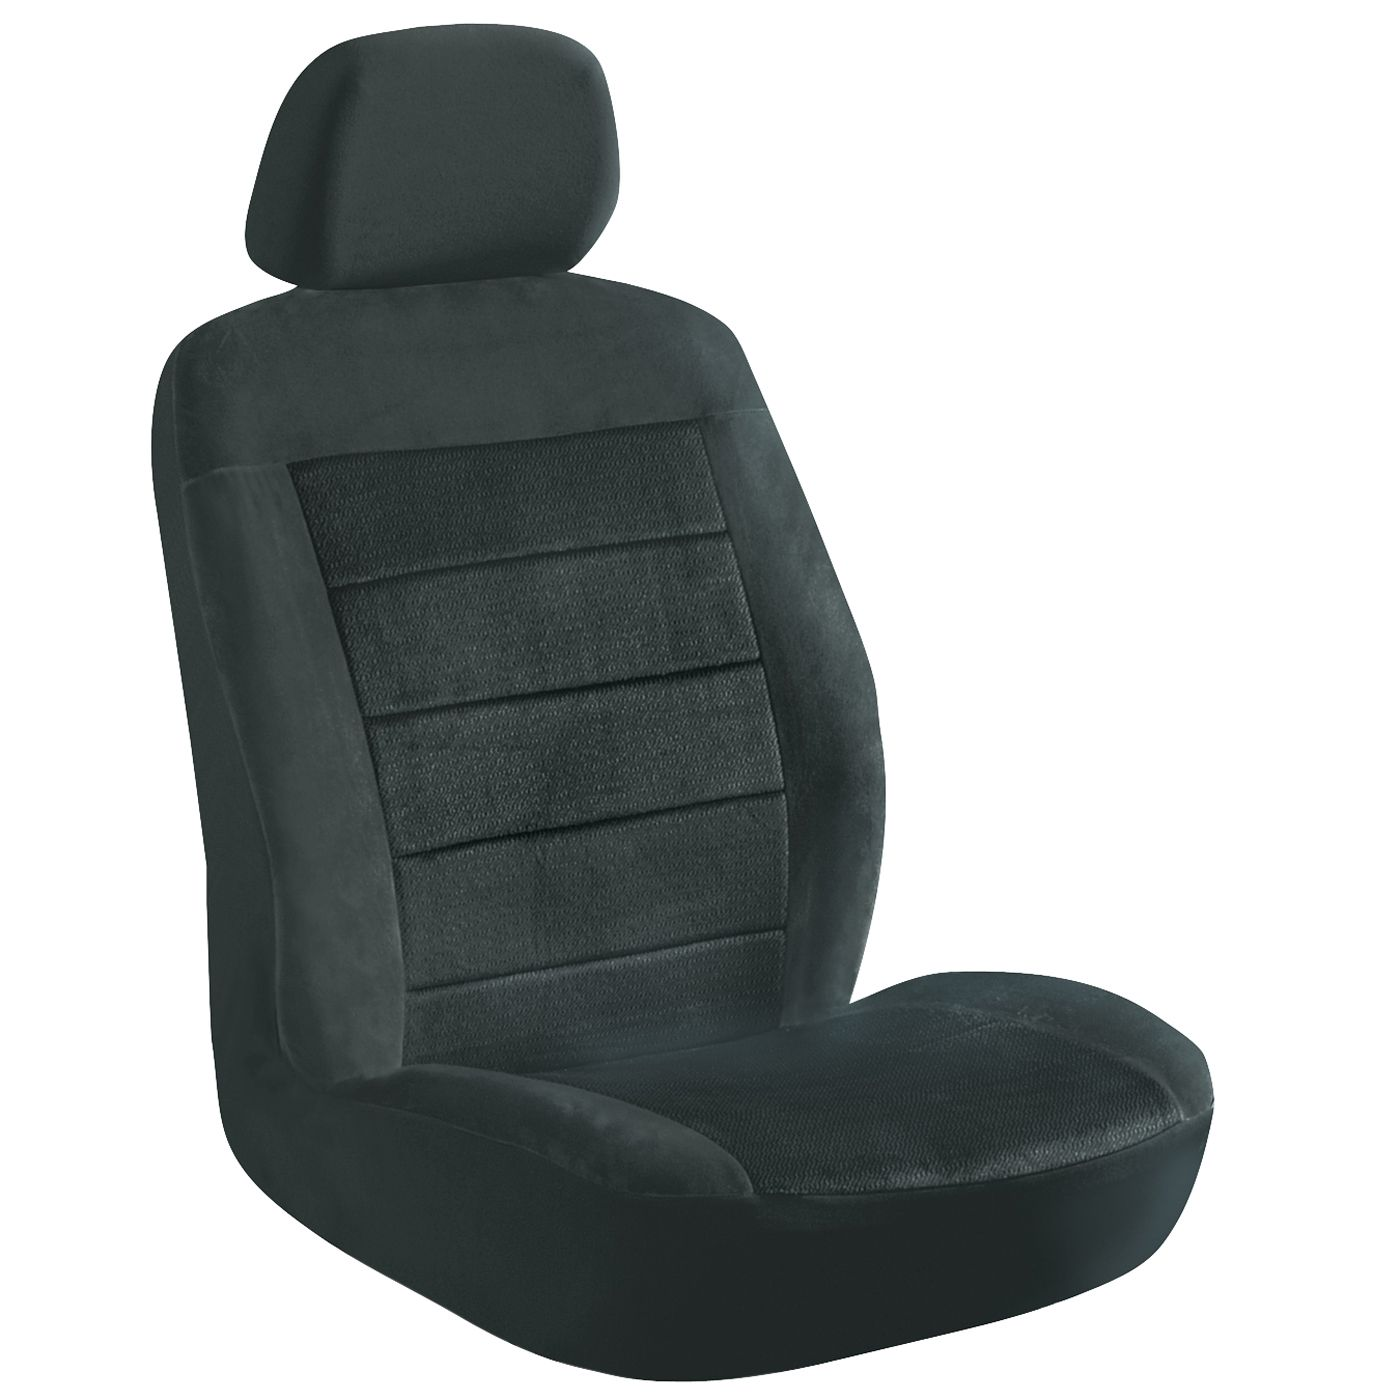 Elegant USA Seat Cover Low Back 2 Piece Royal Velvet Black